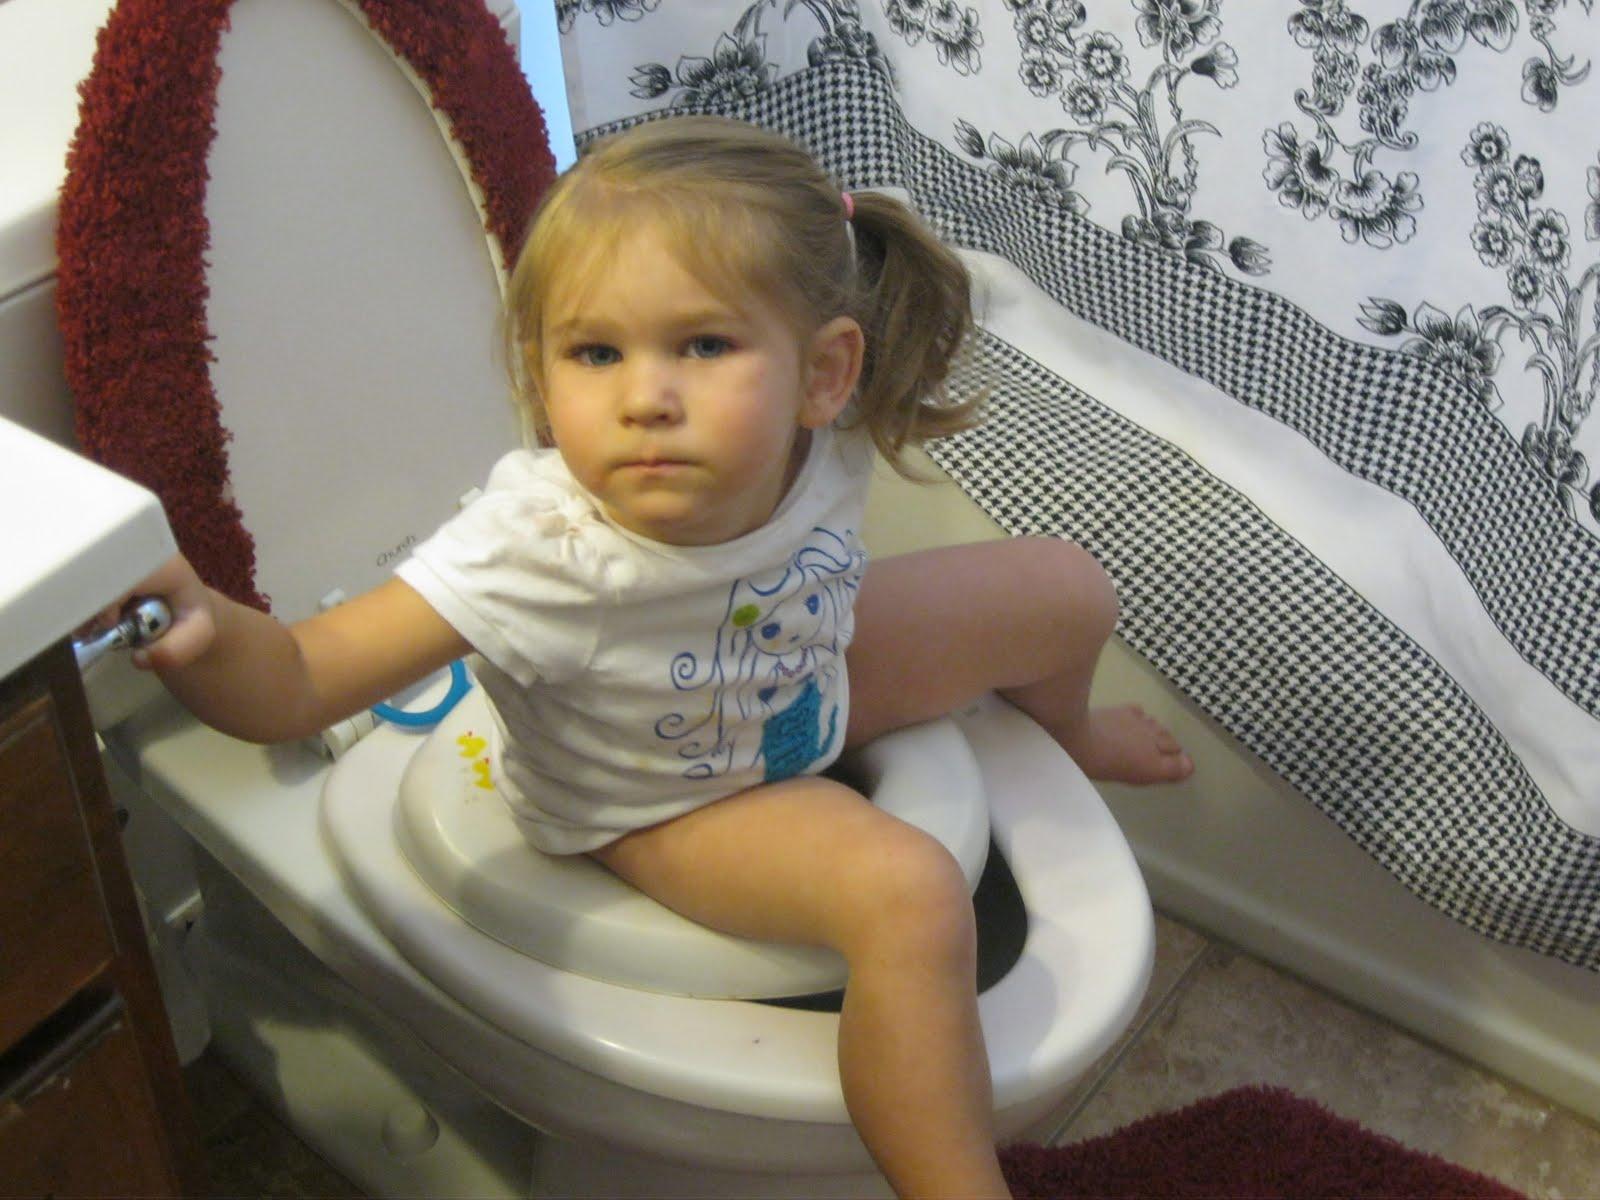 Toilet training cat wont poop in toilet